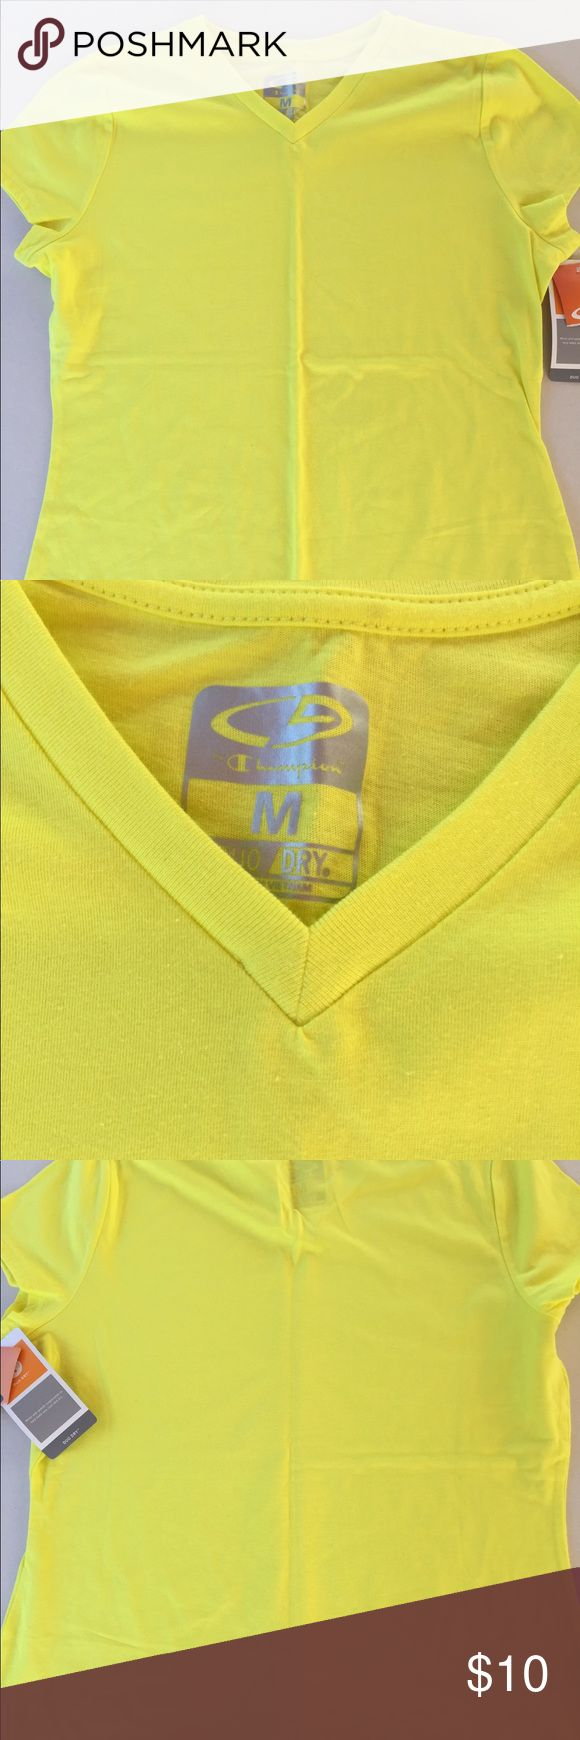 NWT Champion Duo Dry Tshirt NWT Champion Duo Dry T Shirt. Size M Champion Tops Tees - Short Sleeve